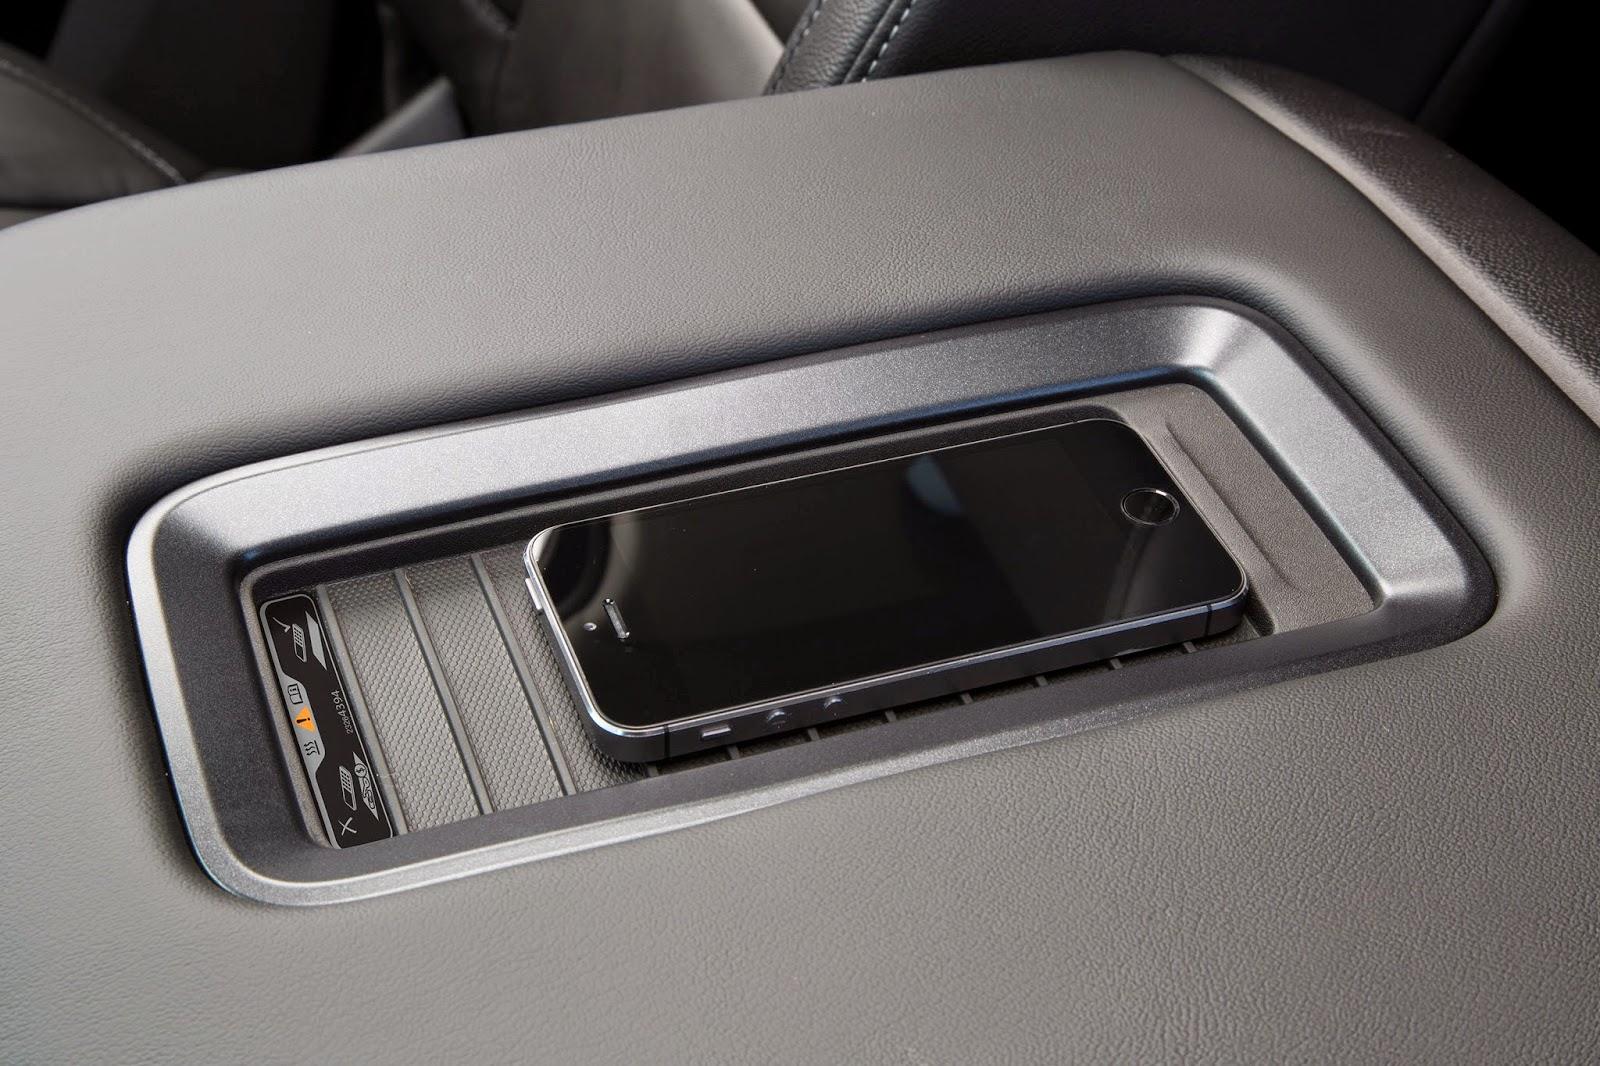 2015 Chevrolet Tahoe & Suburban Z71 Package Revealed